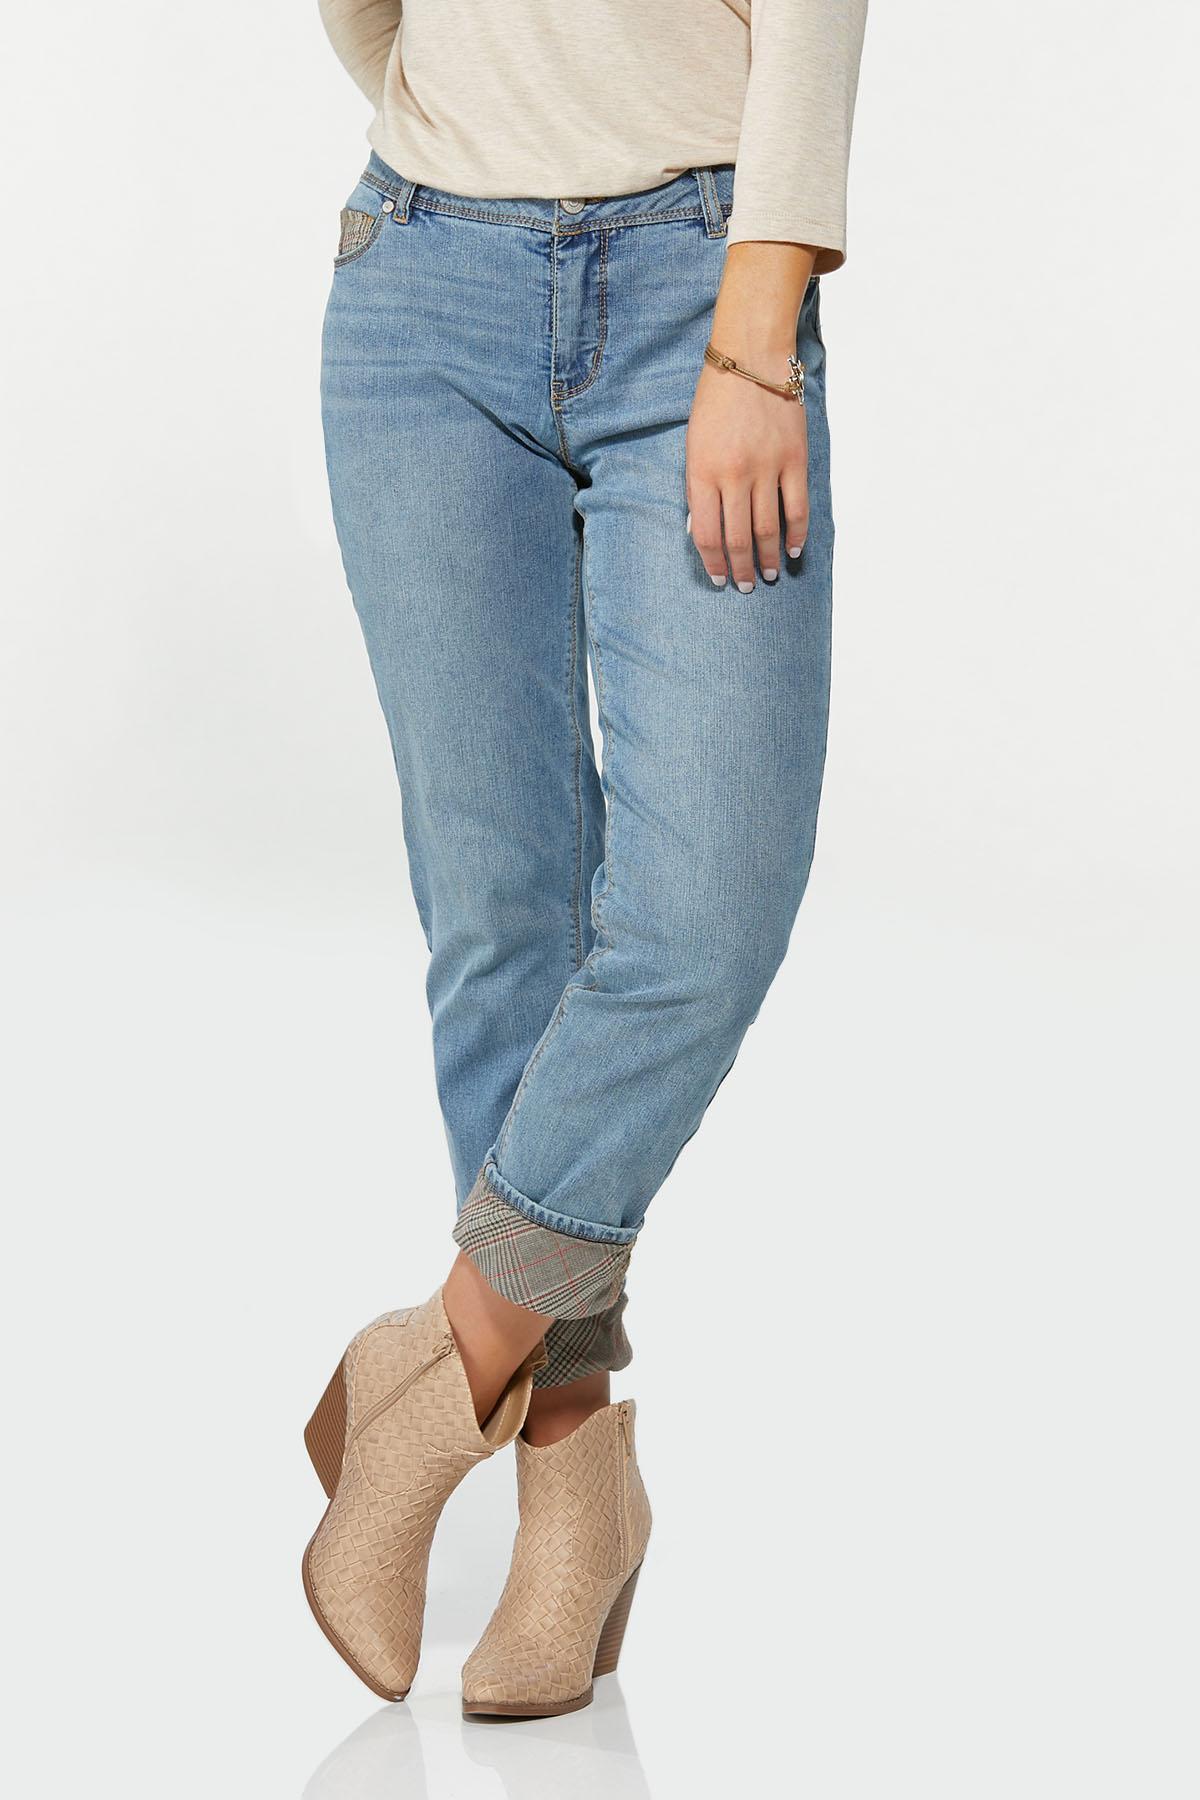 Plaid Cuff Girlfriend Jeans